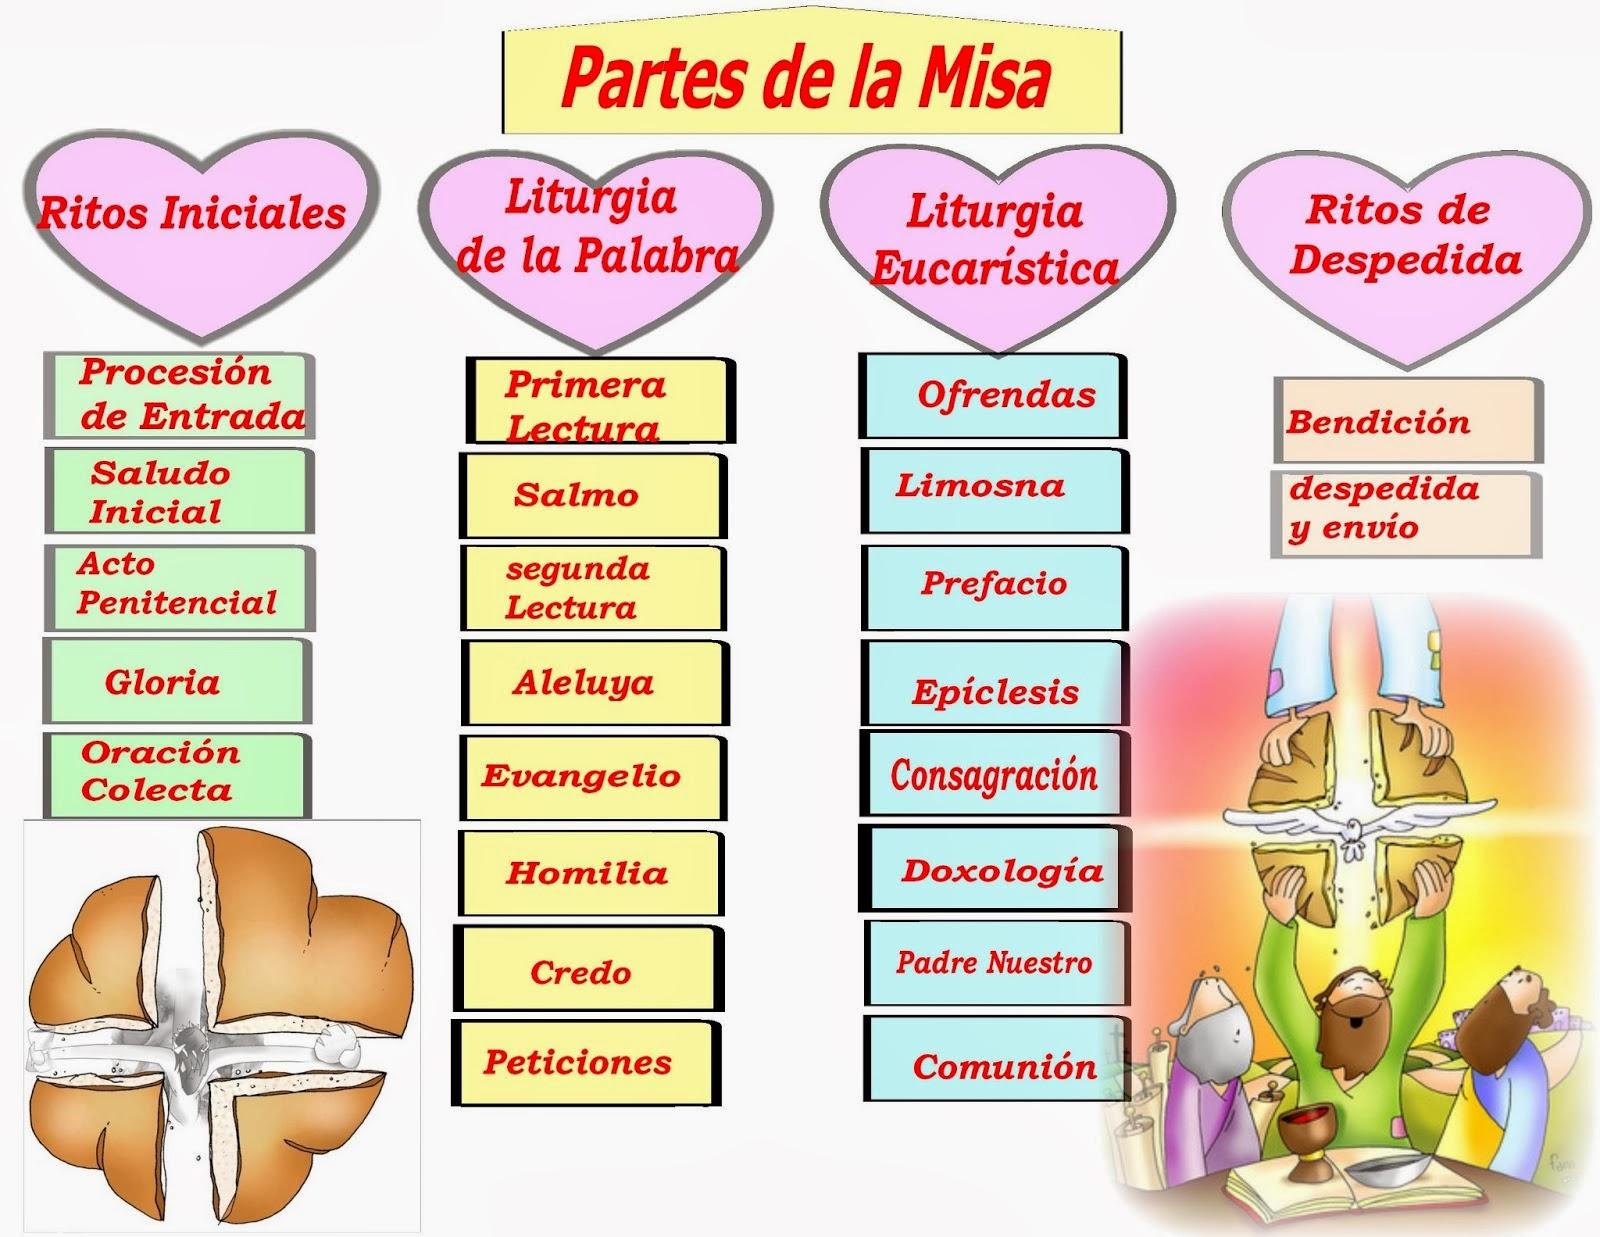 Blog Católico Gotitas Espirituales Besos En El Aire: ® Blog Católico Gotitas Espirituales ®: Lunes 18 De